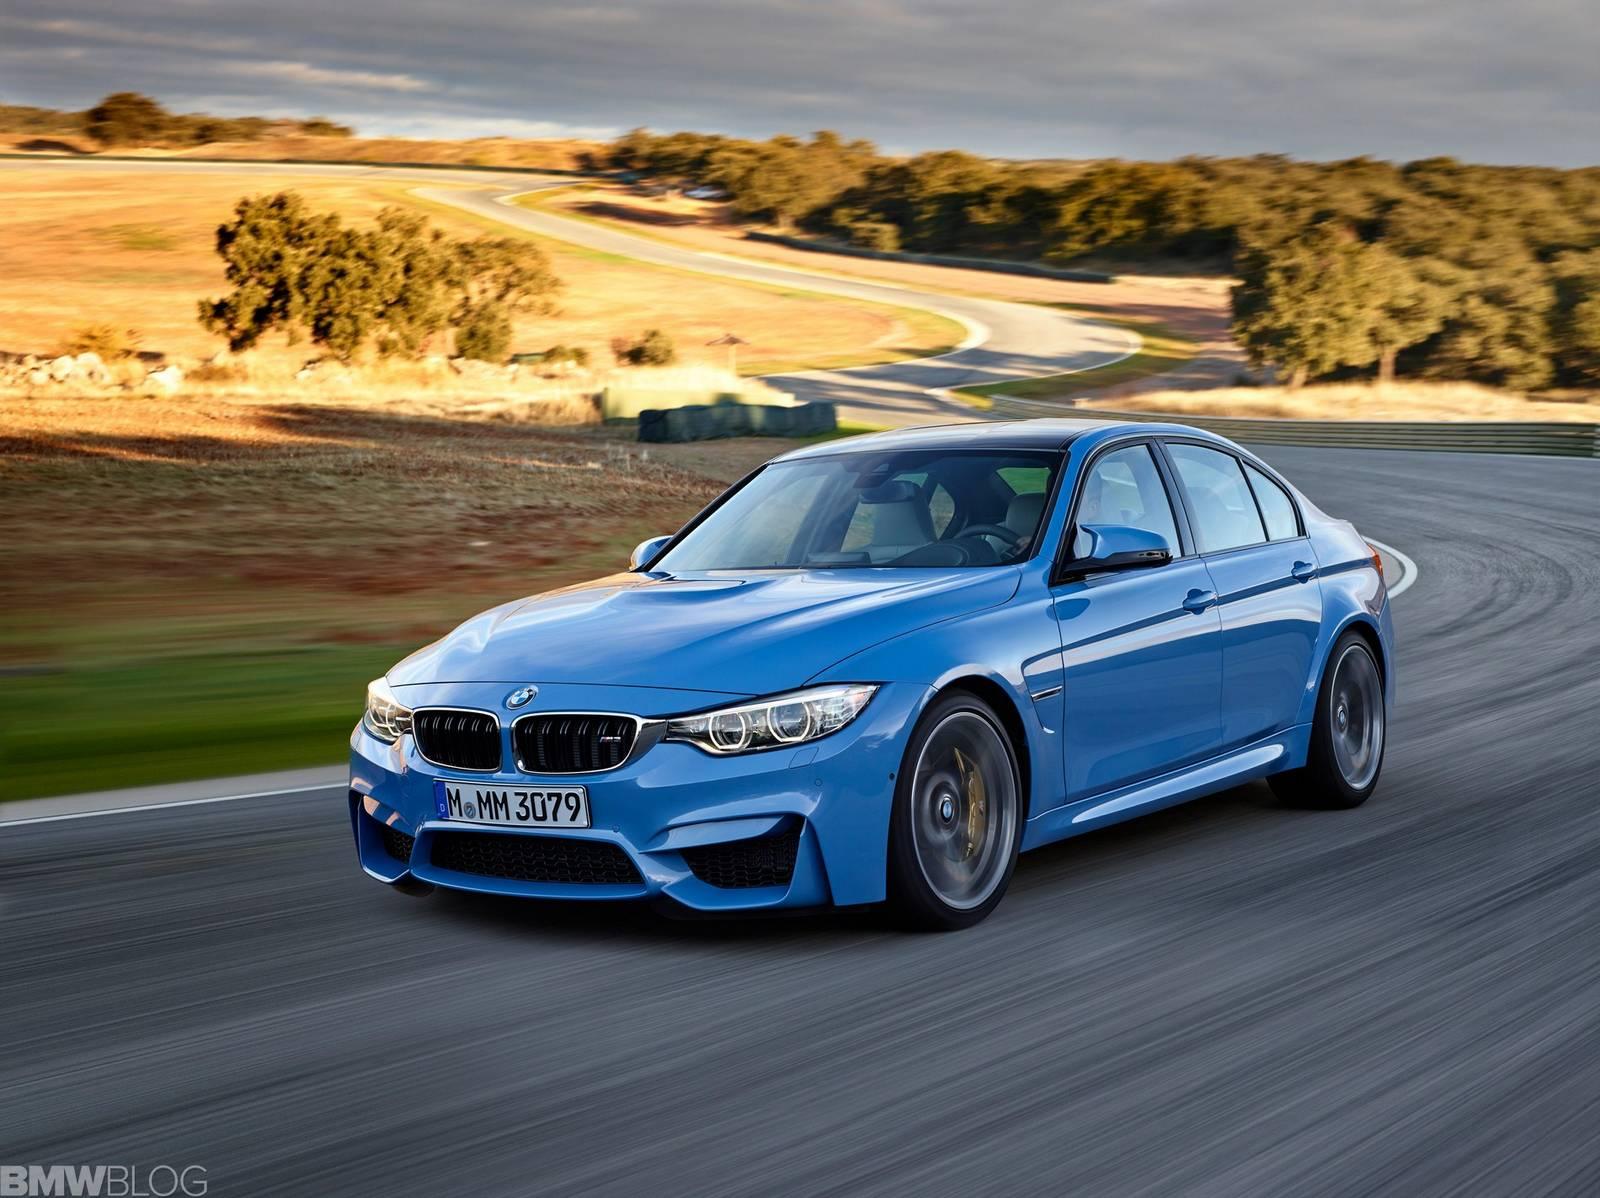 BMW M And BMW M Coupe Leaked GTspirit - Bmw 2014 m3